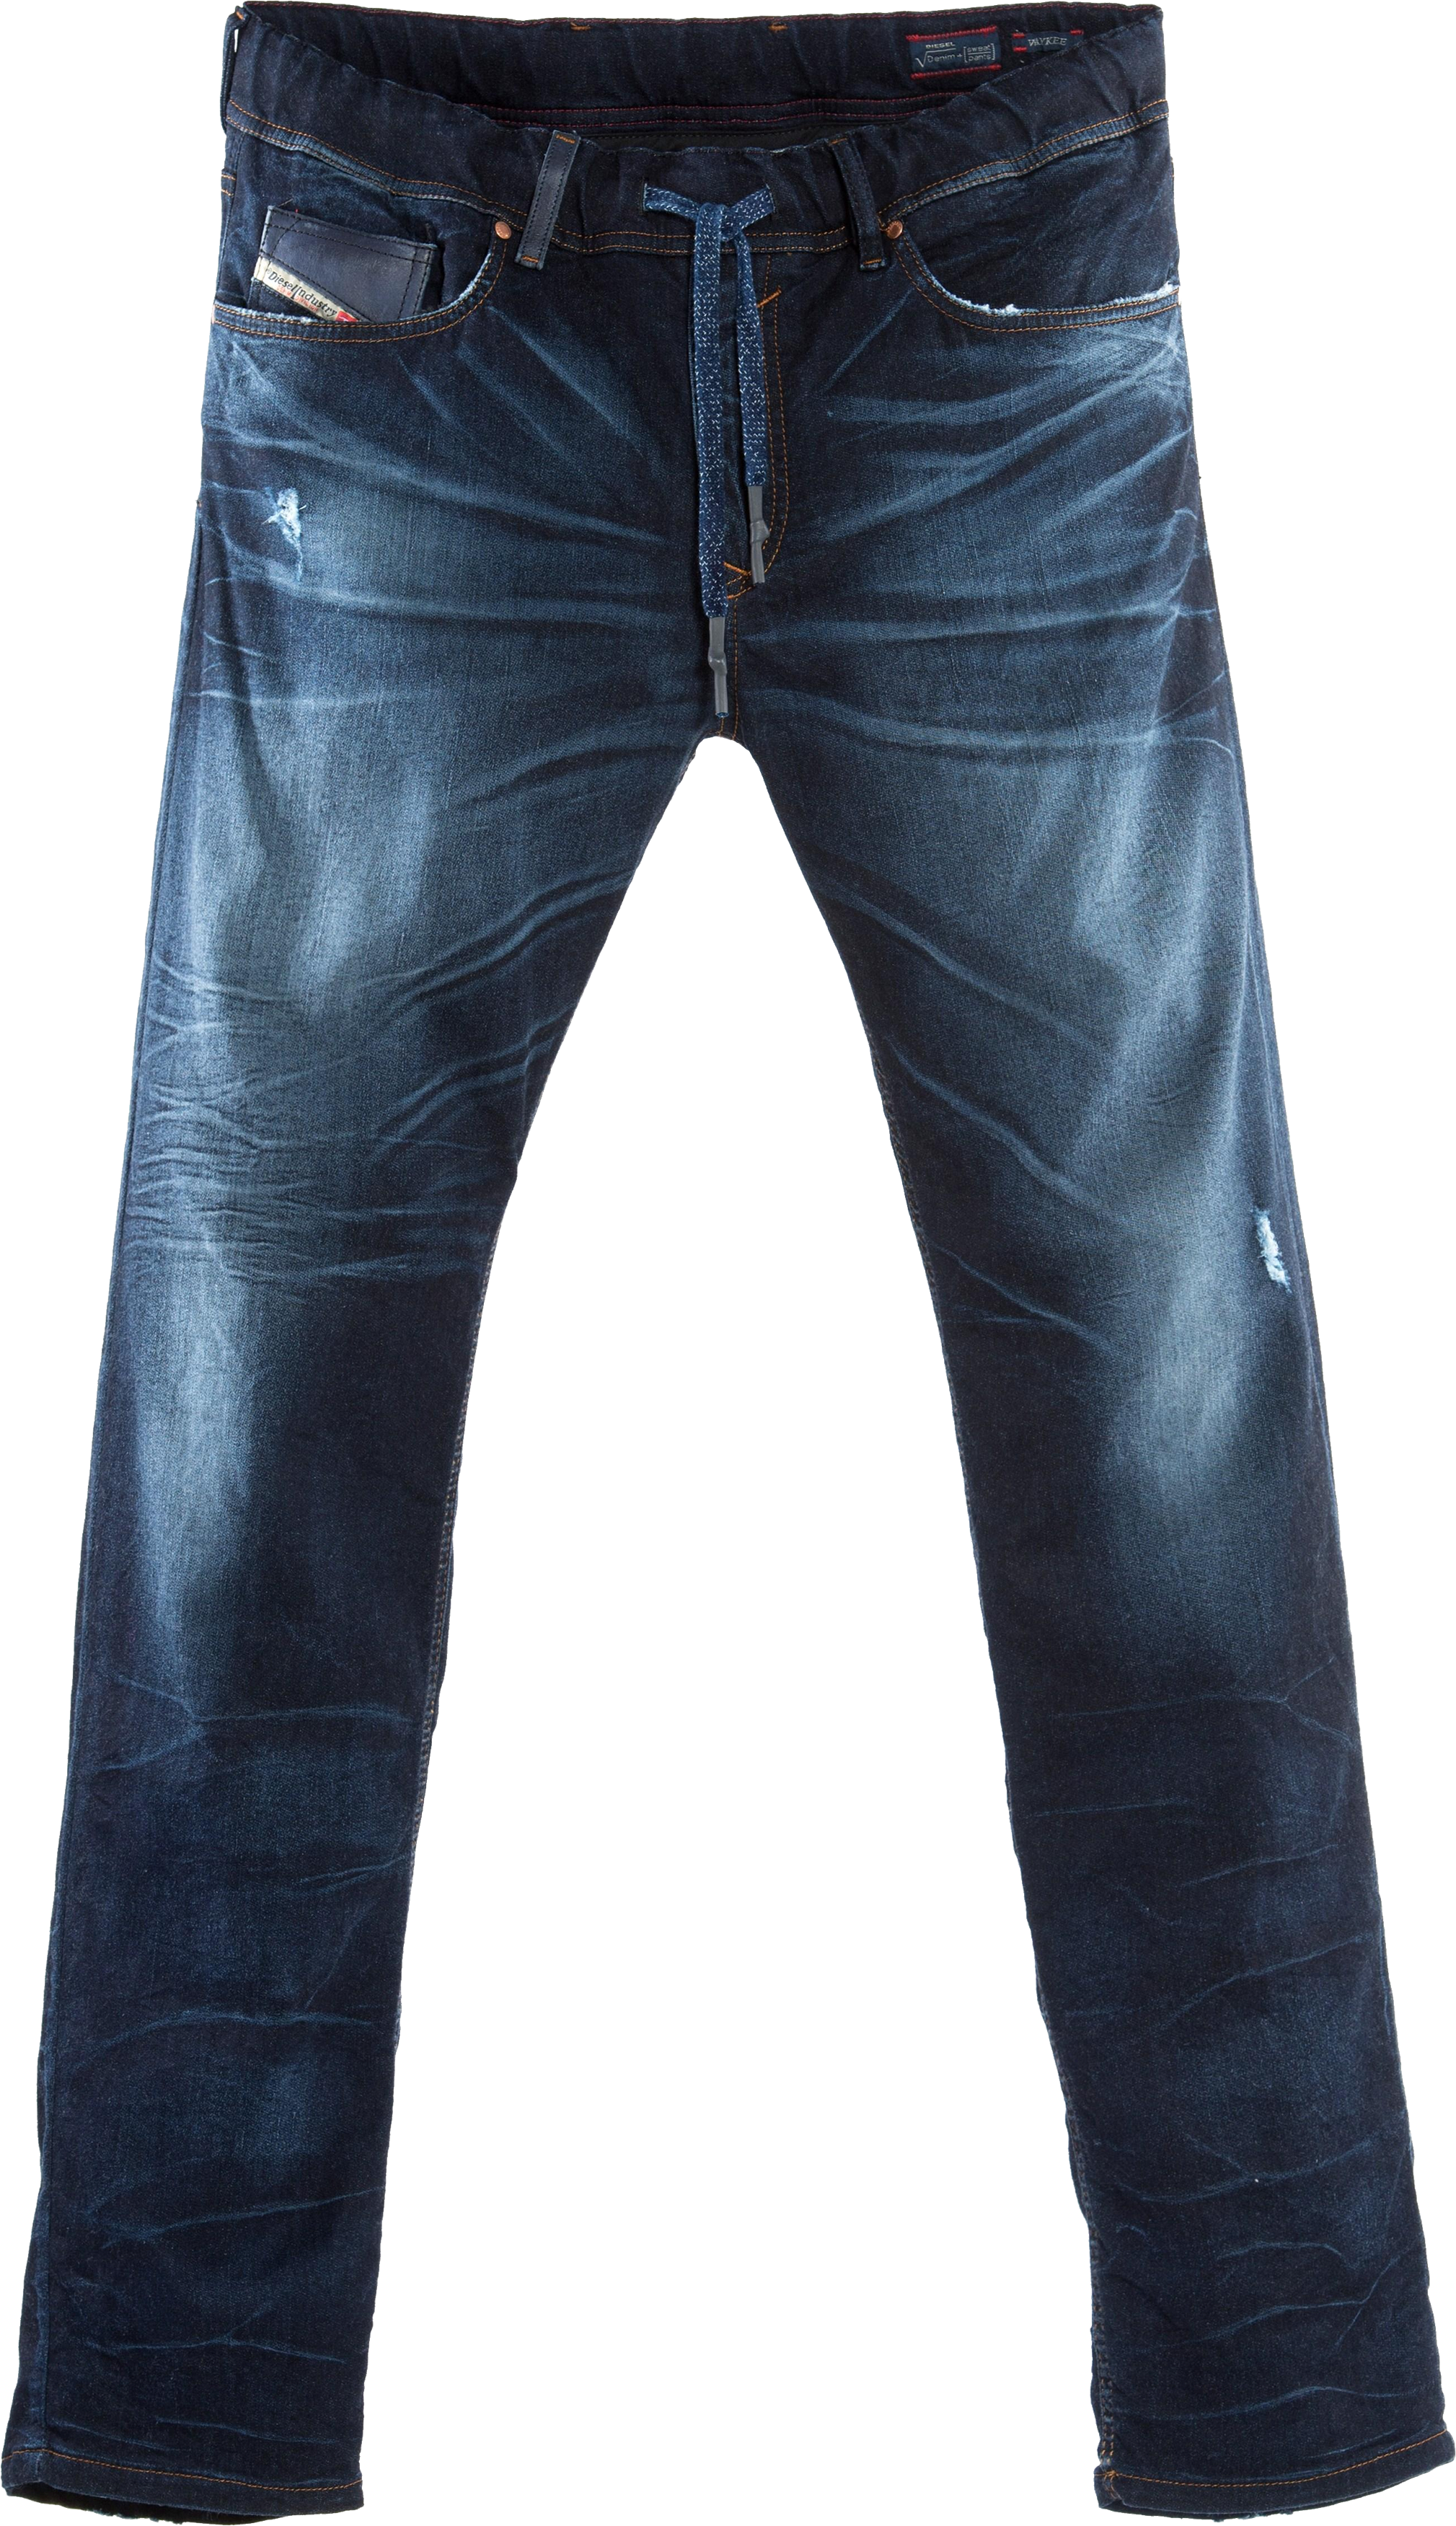 Men's Original  Jeans PNG Image